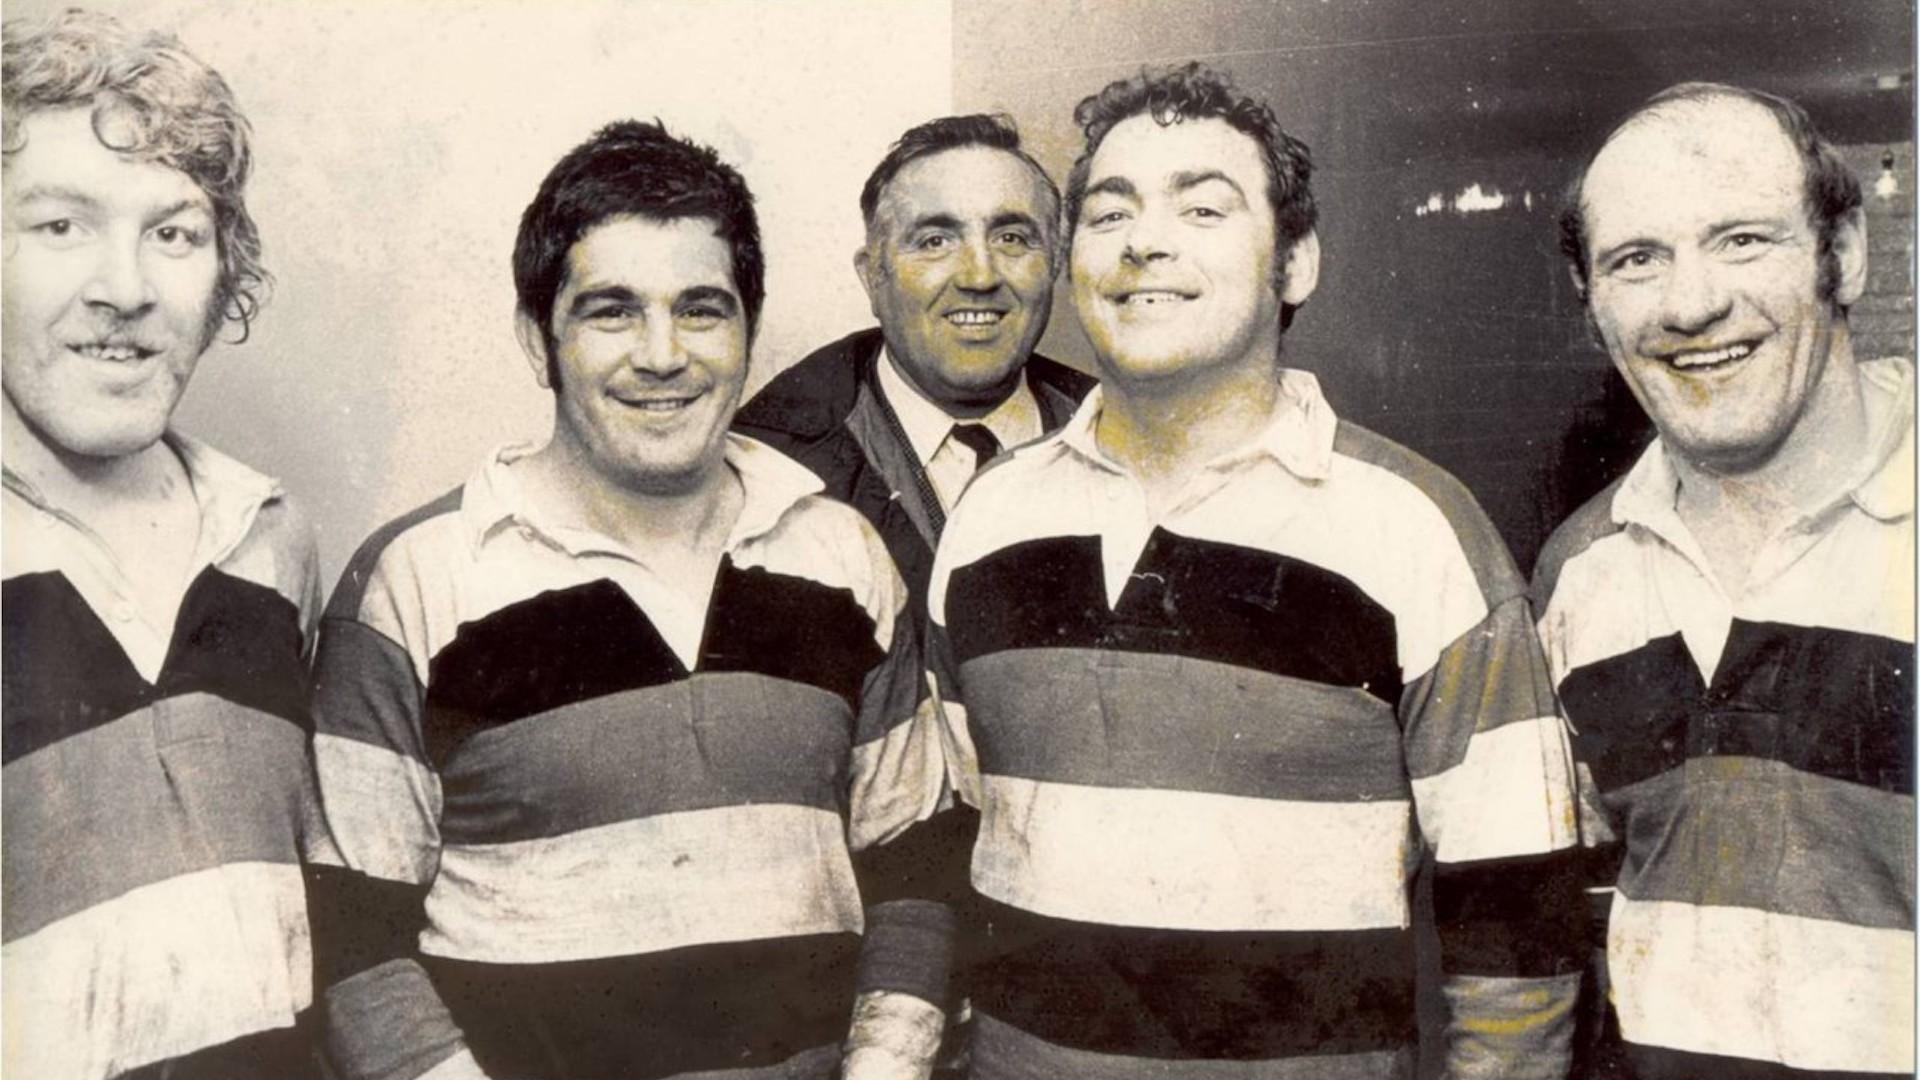 Lions and Pontypool legend Ray Prosser dies aged 93